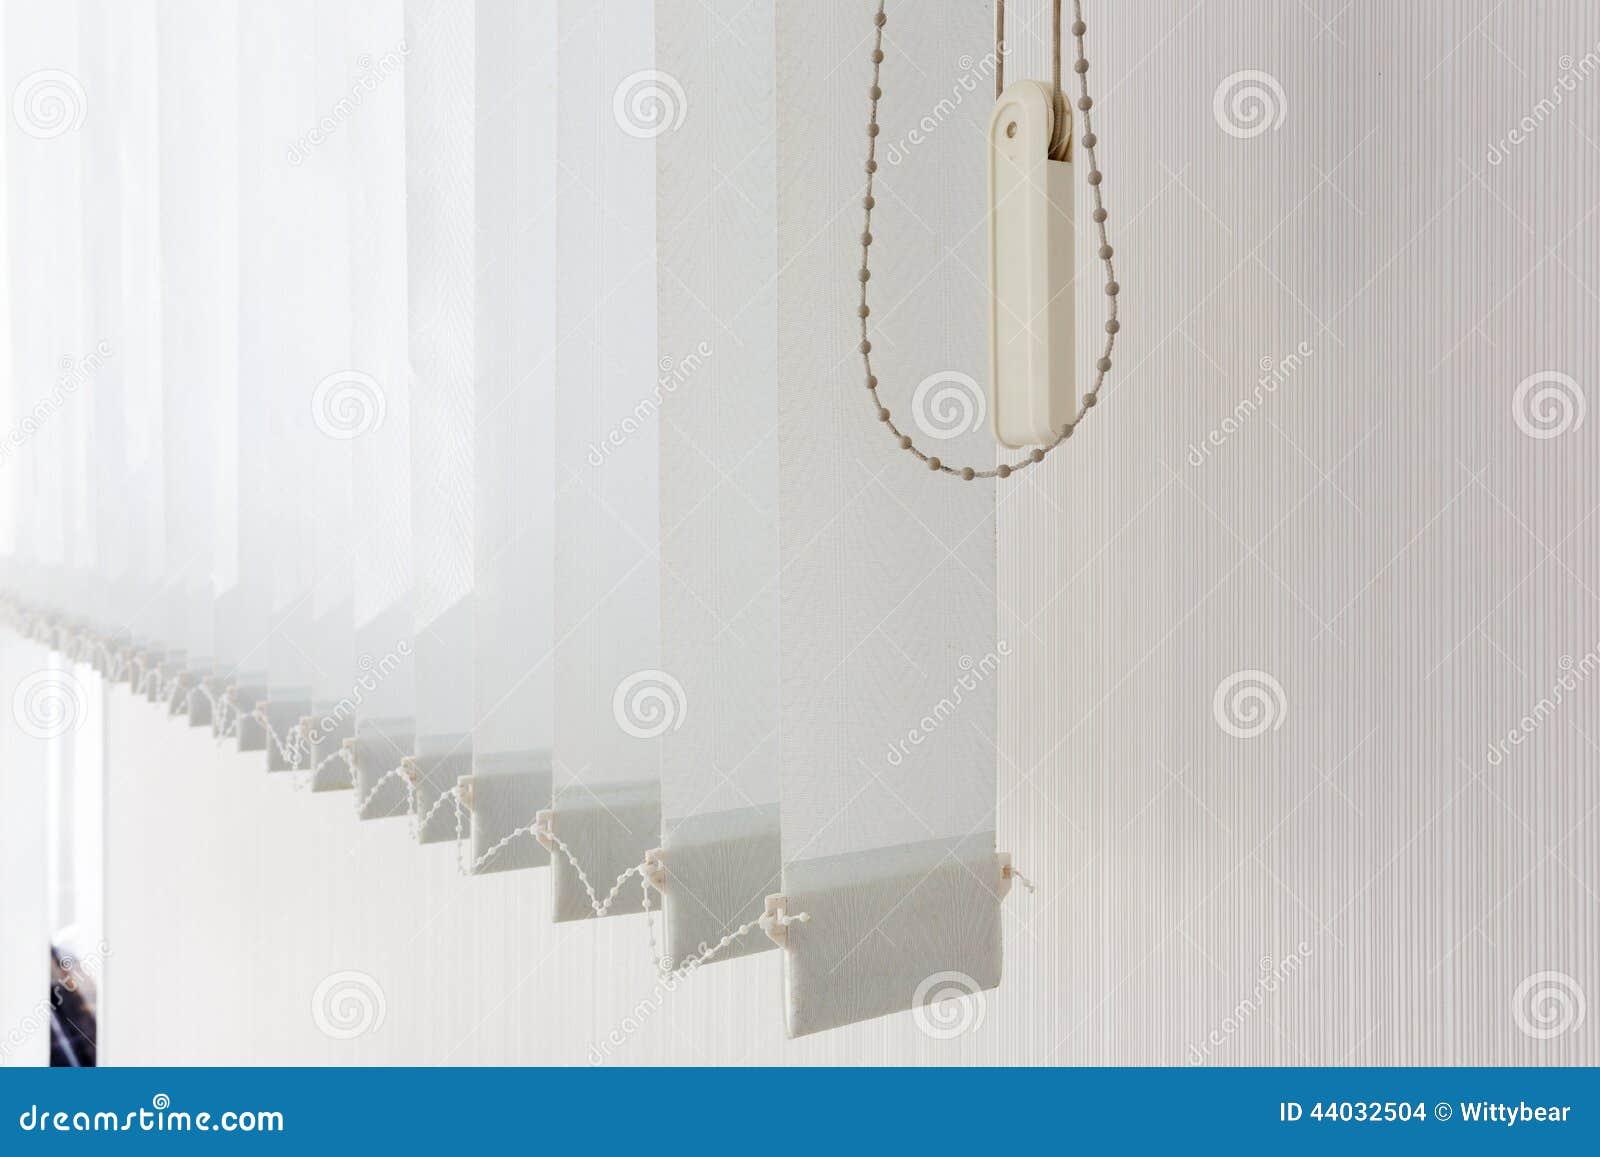 vorh nge f r b ro und haus stockfoto bild 44032504. Black Bedroom Furniture Sets. Home Design Ideas